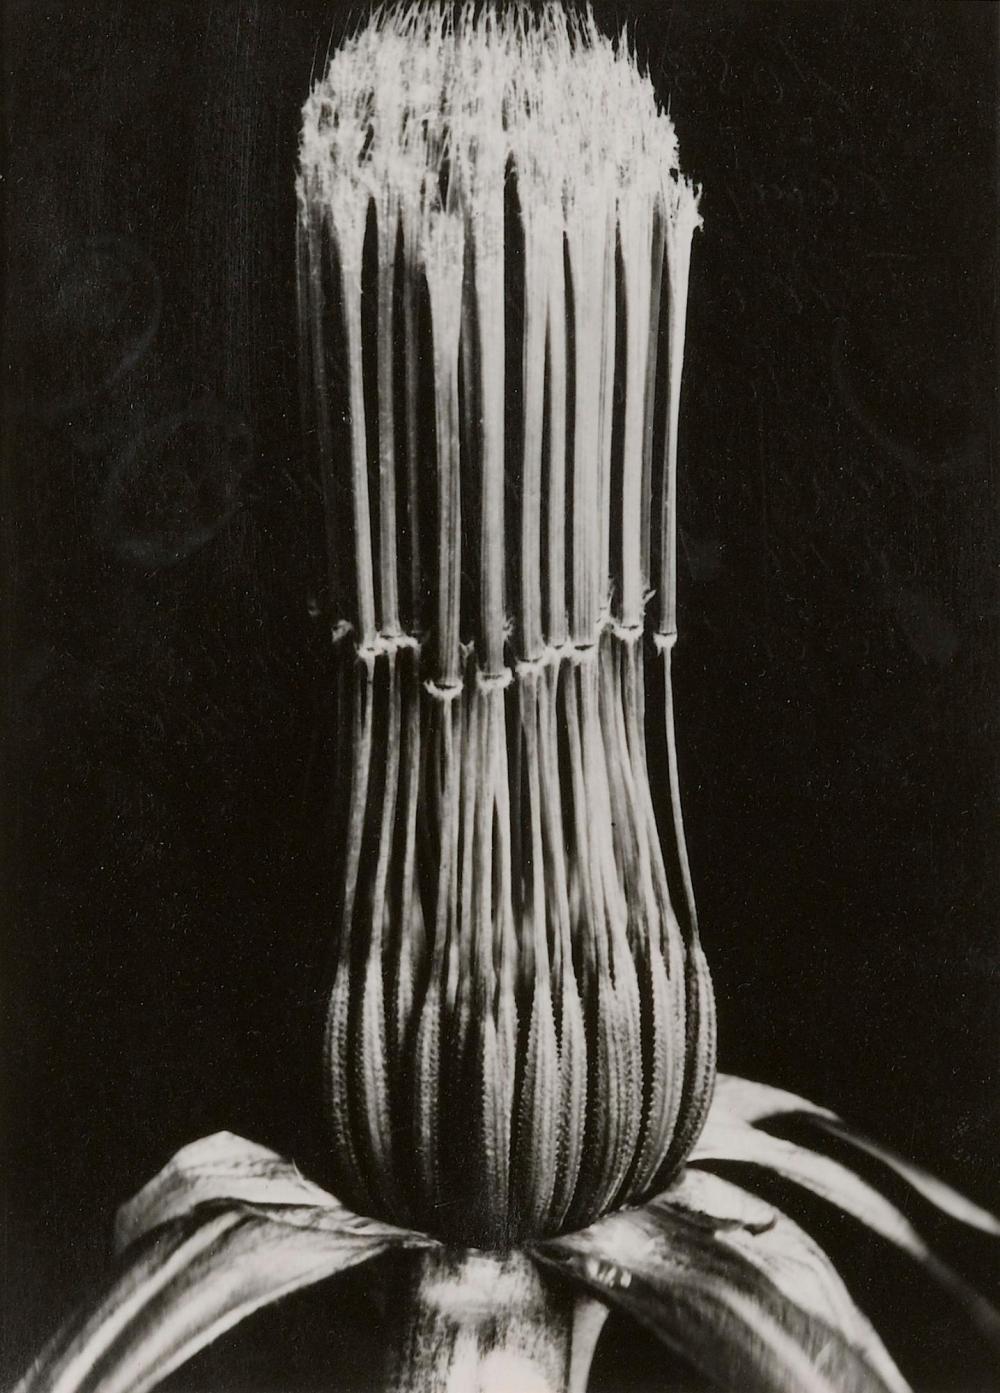 ALBERT RENGER-PATZSCH   Compositae, Tragopogon pratense, 1930 - 1939